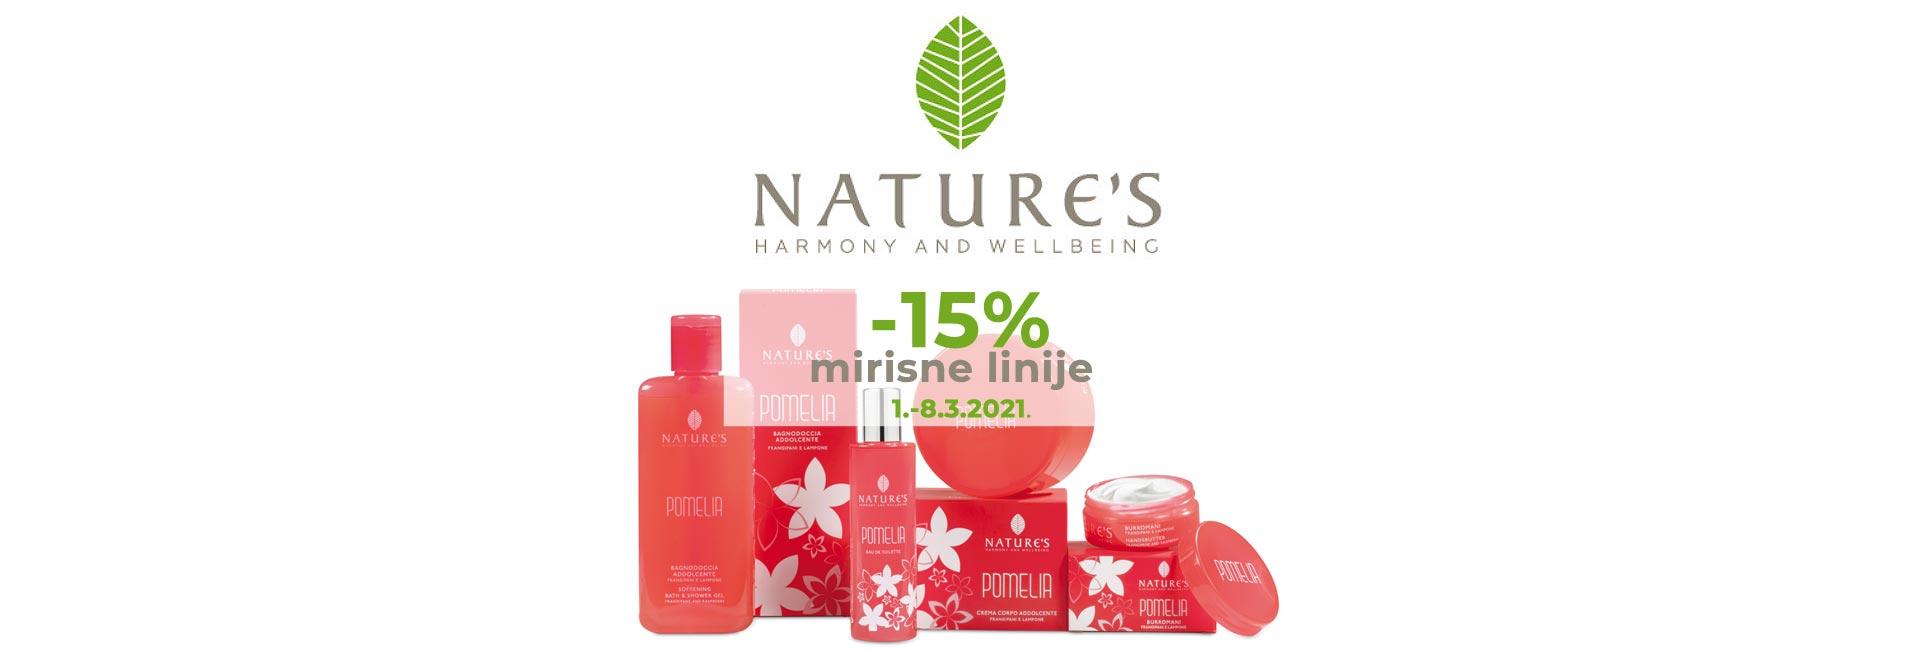 natures -15% 1.-8.3.2021.